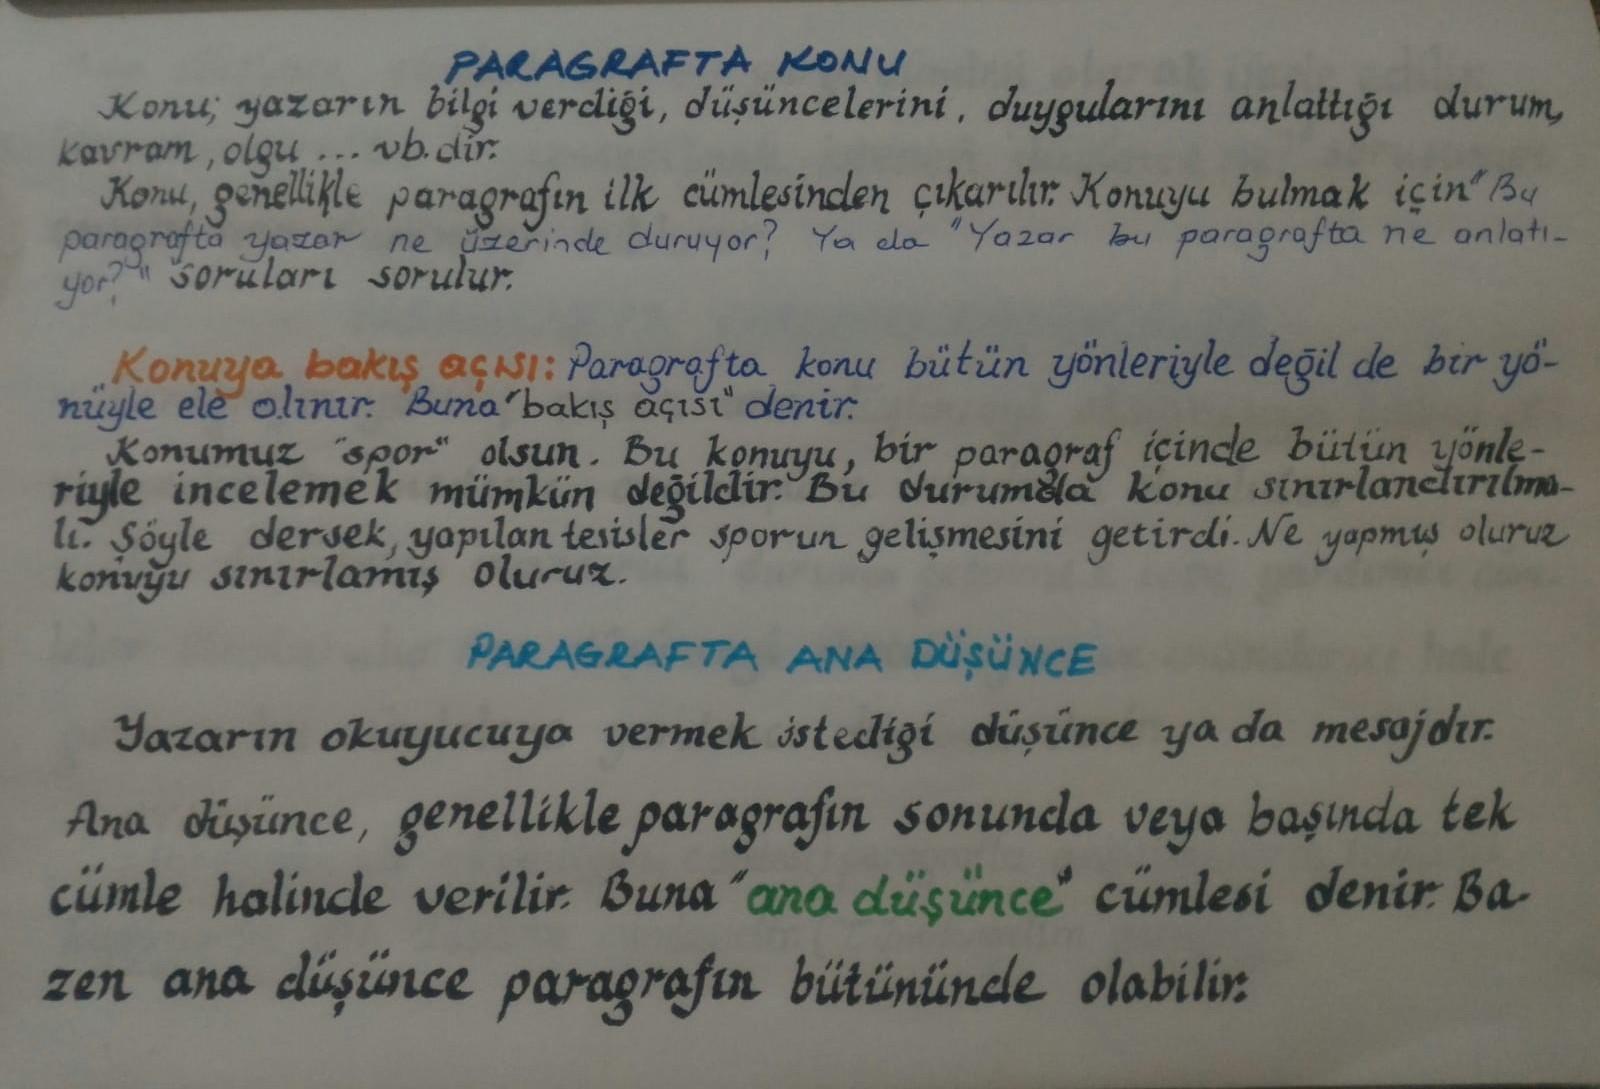 Paragrafta_konu_3